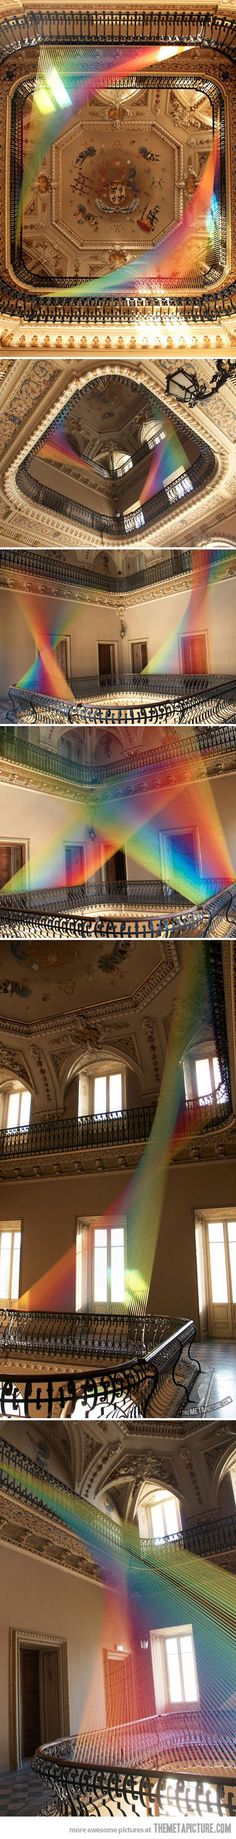 Unbelievable thread installation in Italy…